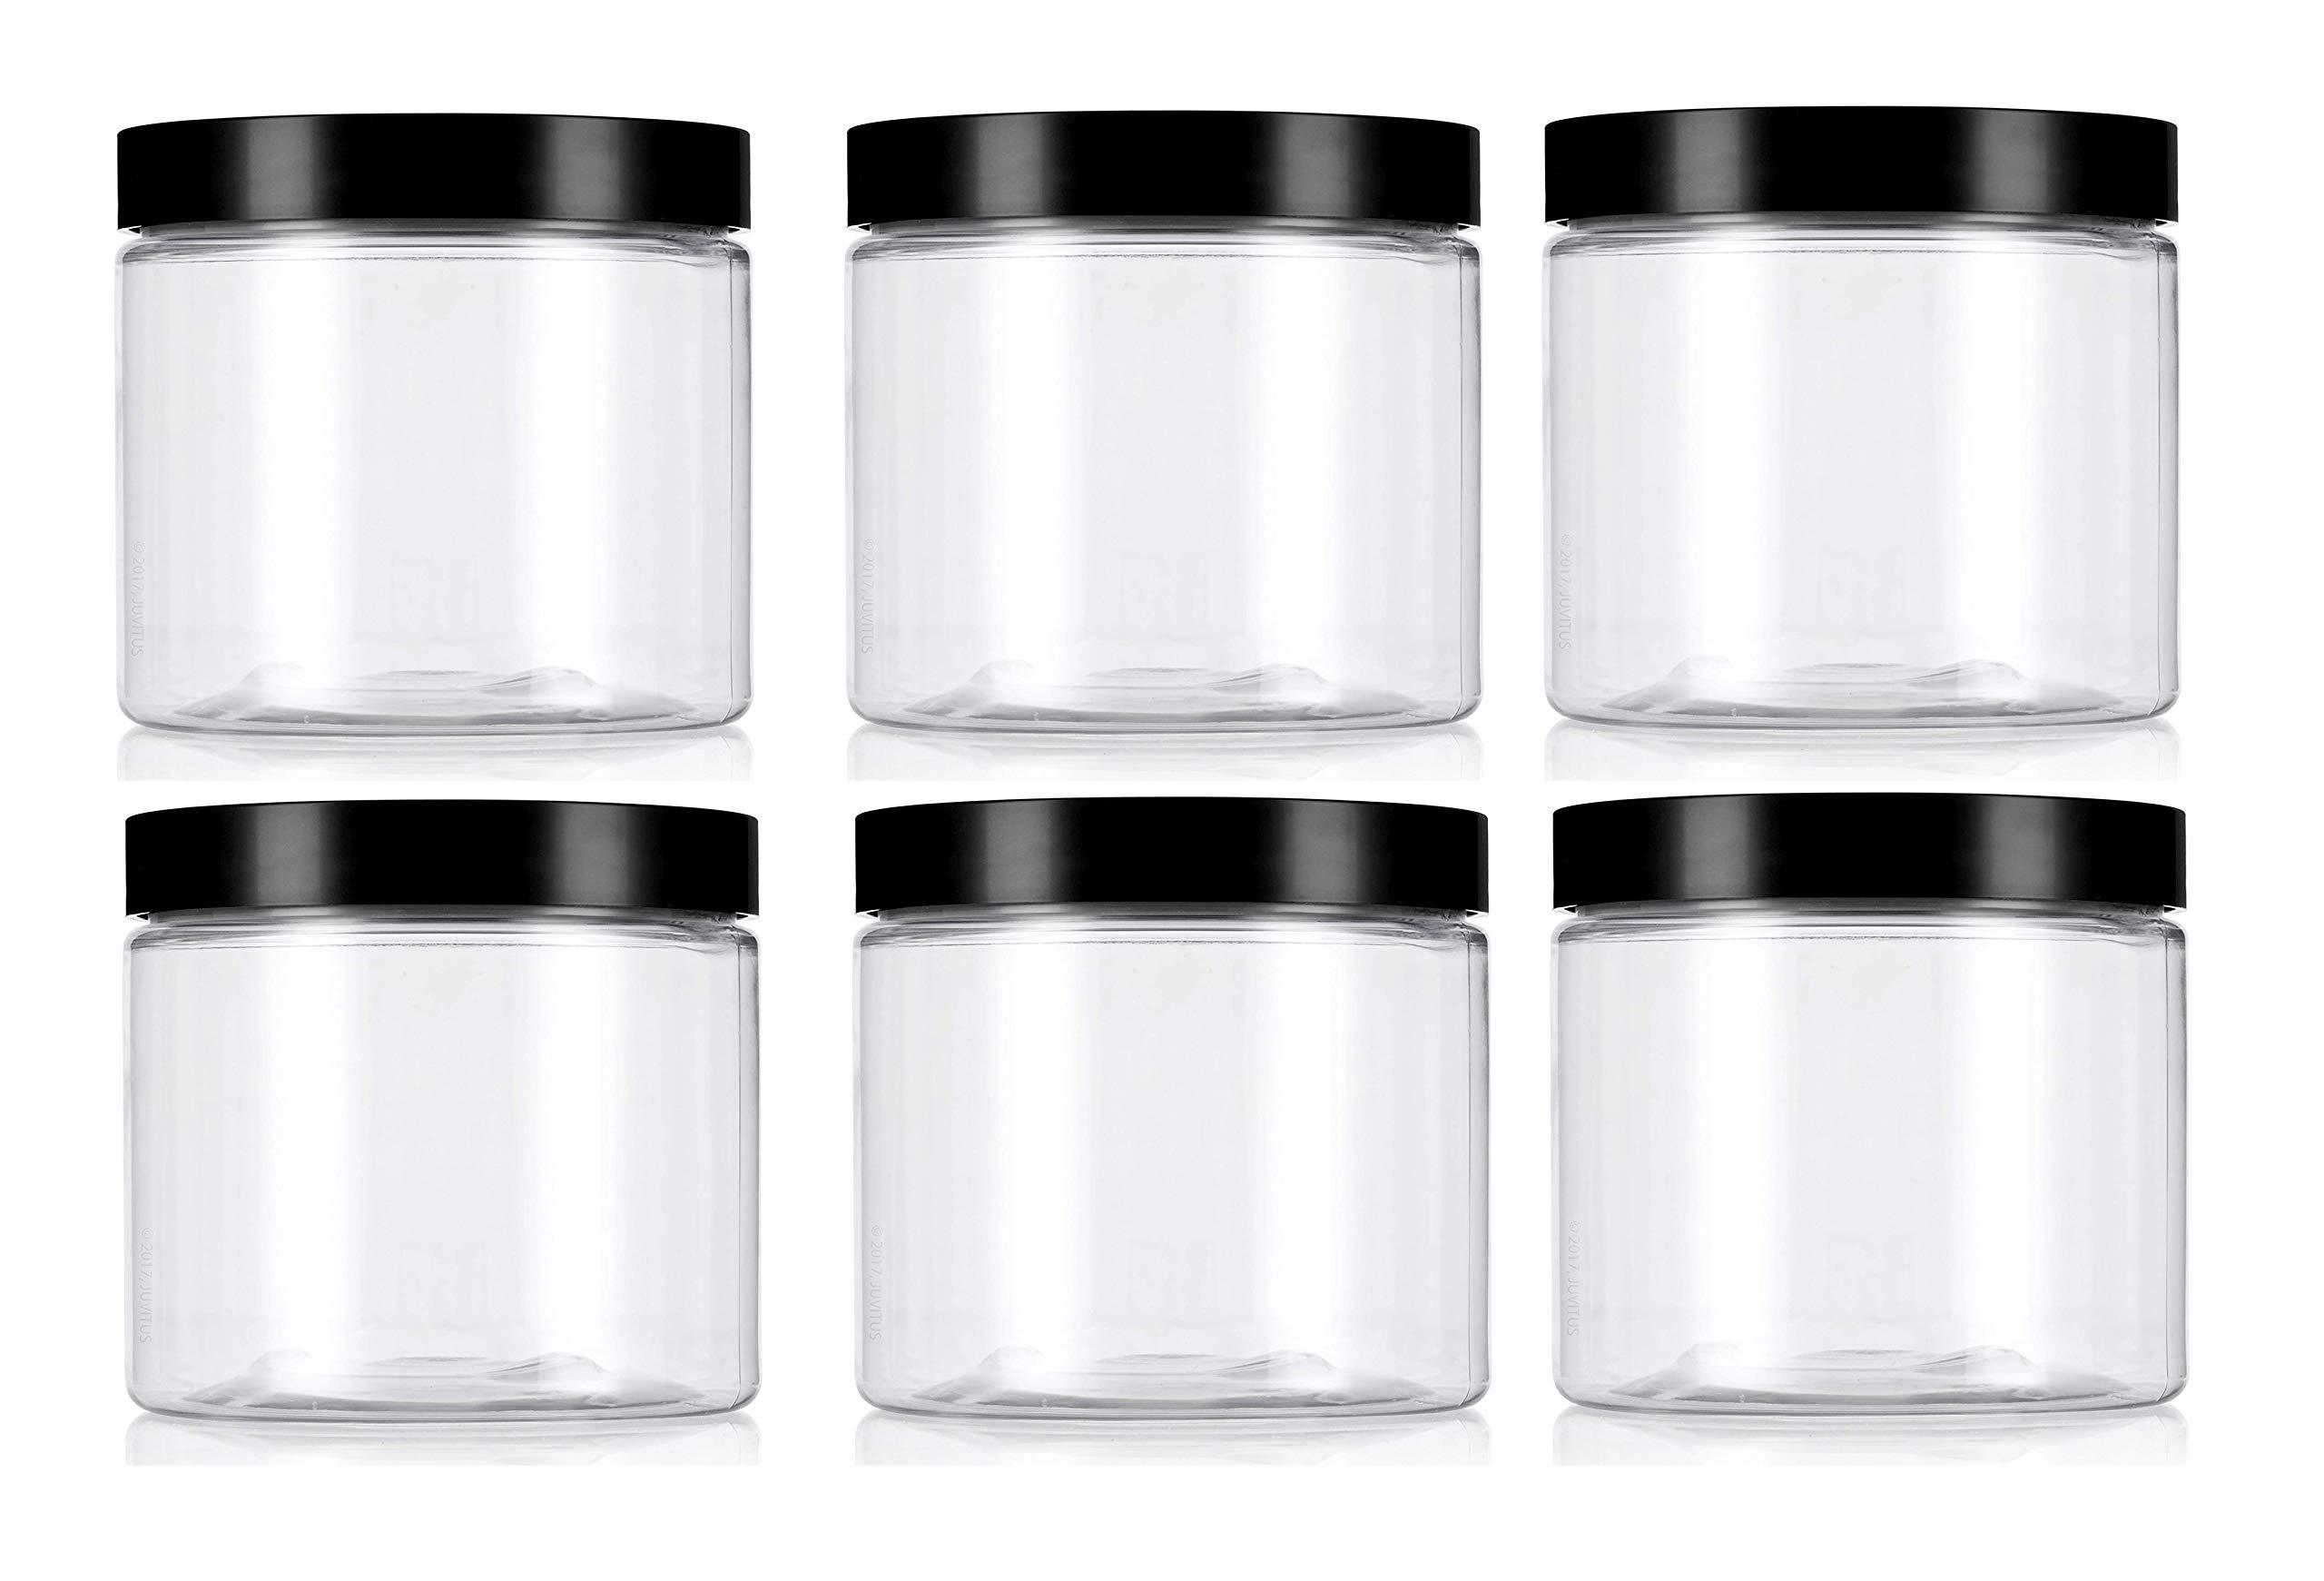 Premium Vials CRC870400-6 Clear Plastic Jar with Black Lid, 8 oz Capacity (Pack of 6) by Premium Vials